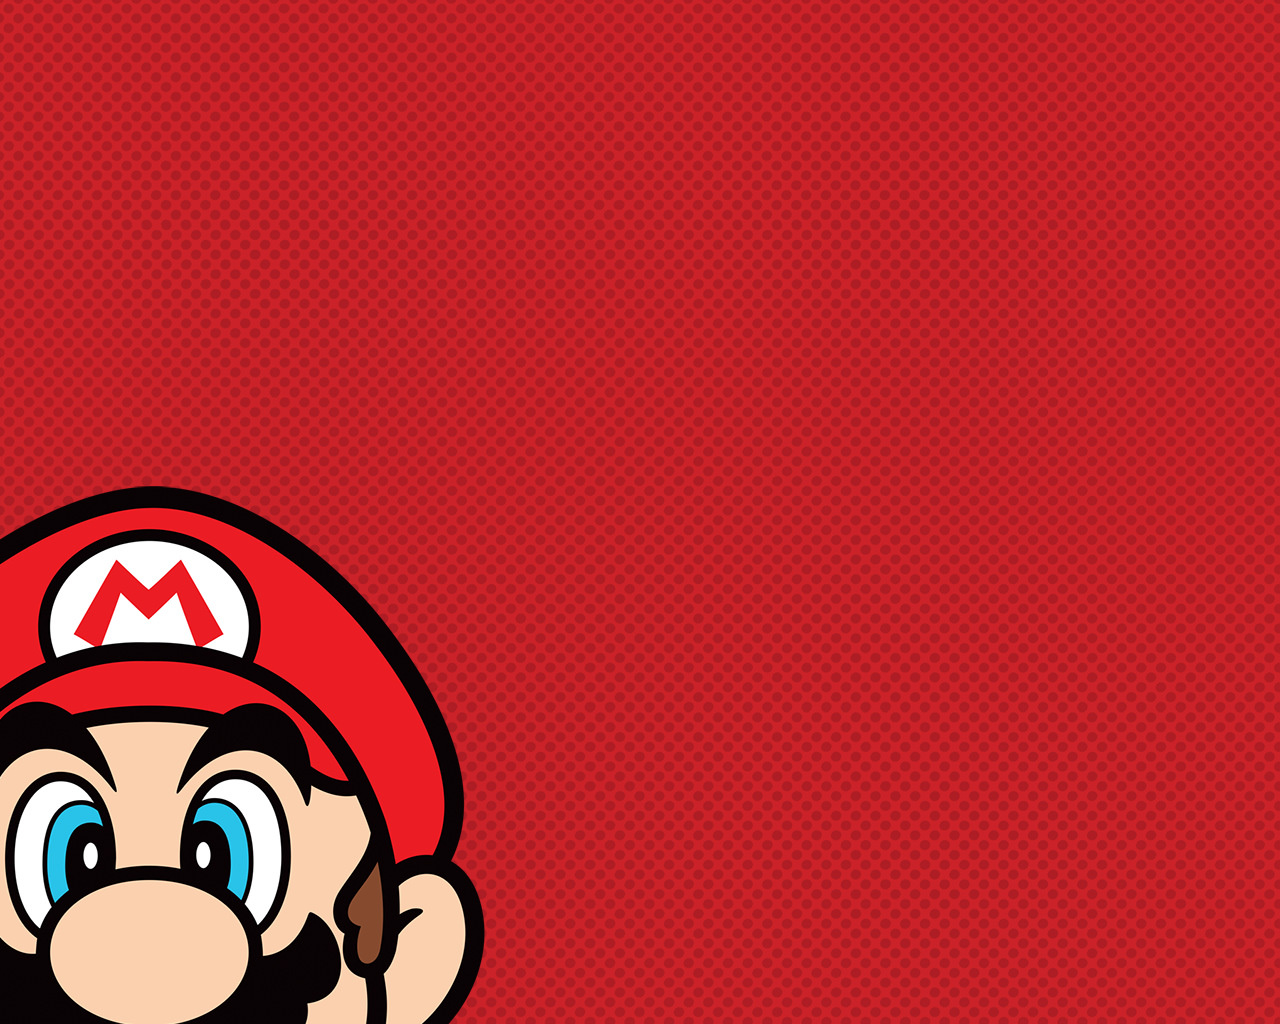 Super_Mario_Red_1280x1024.jpg